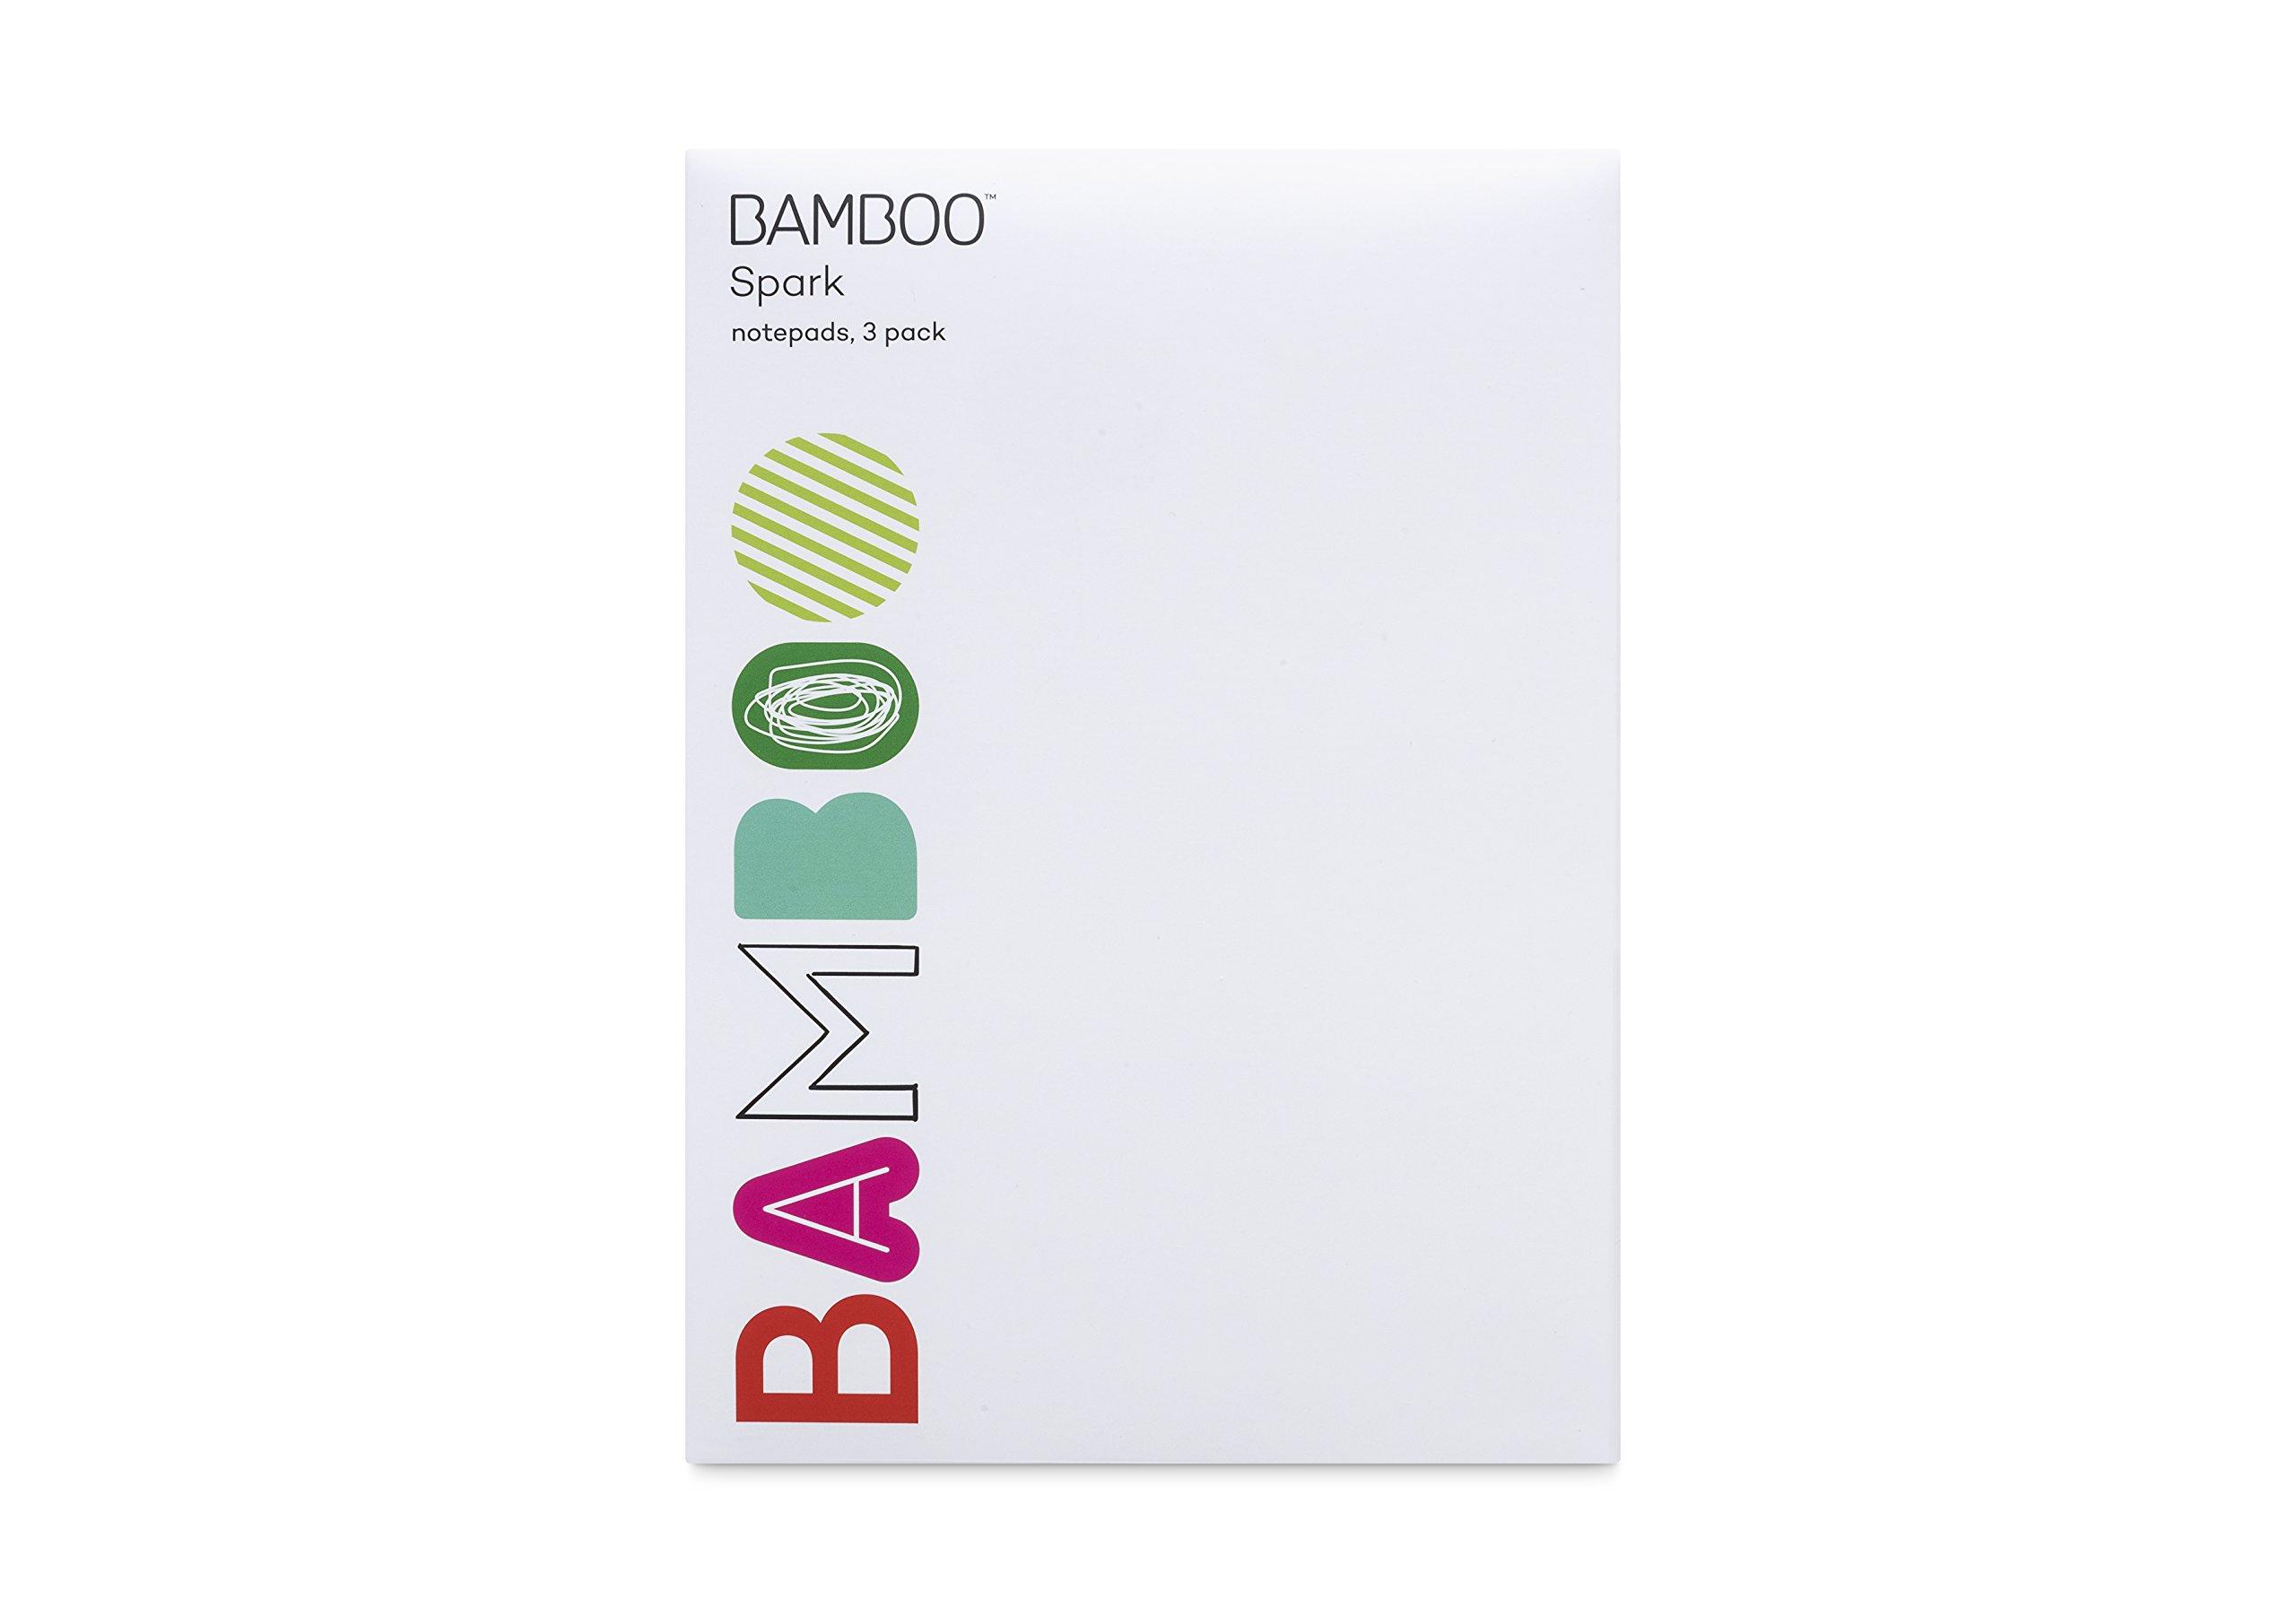 Wacom Bamboo Spark Notepads (ACK41508)